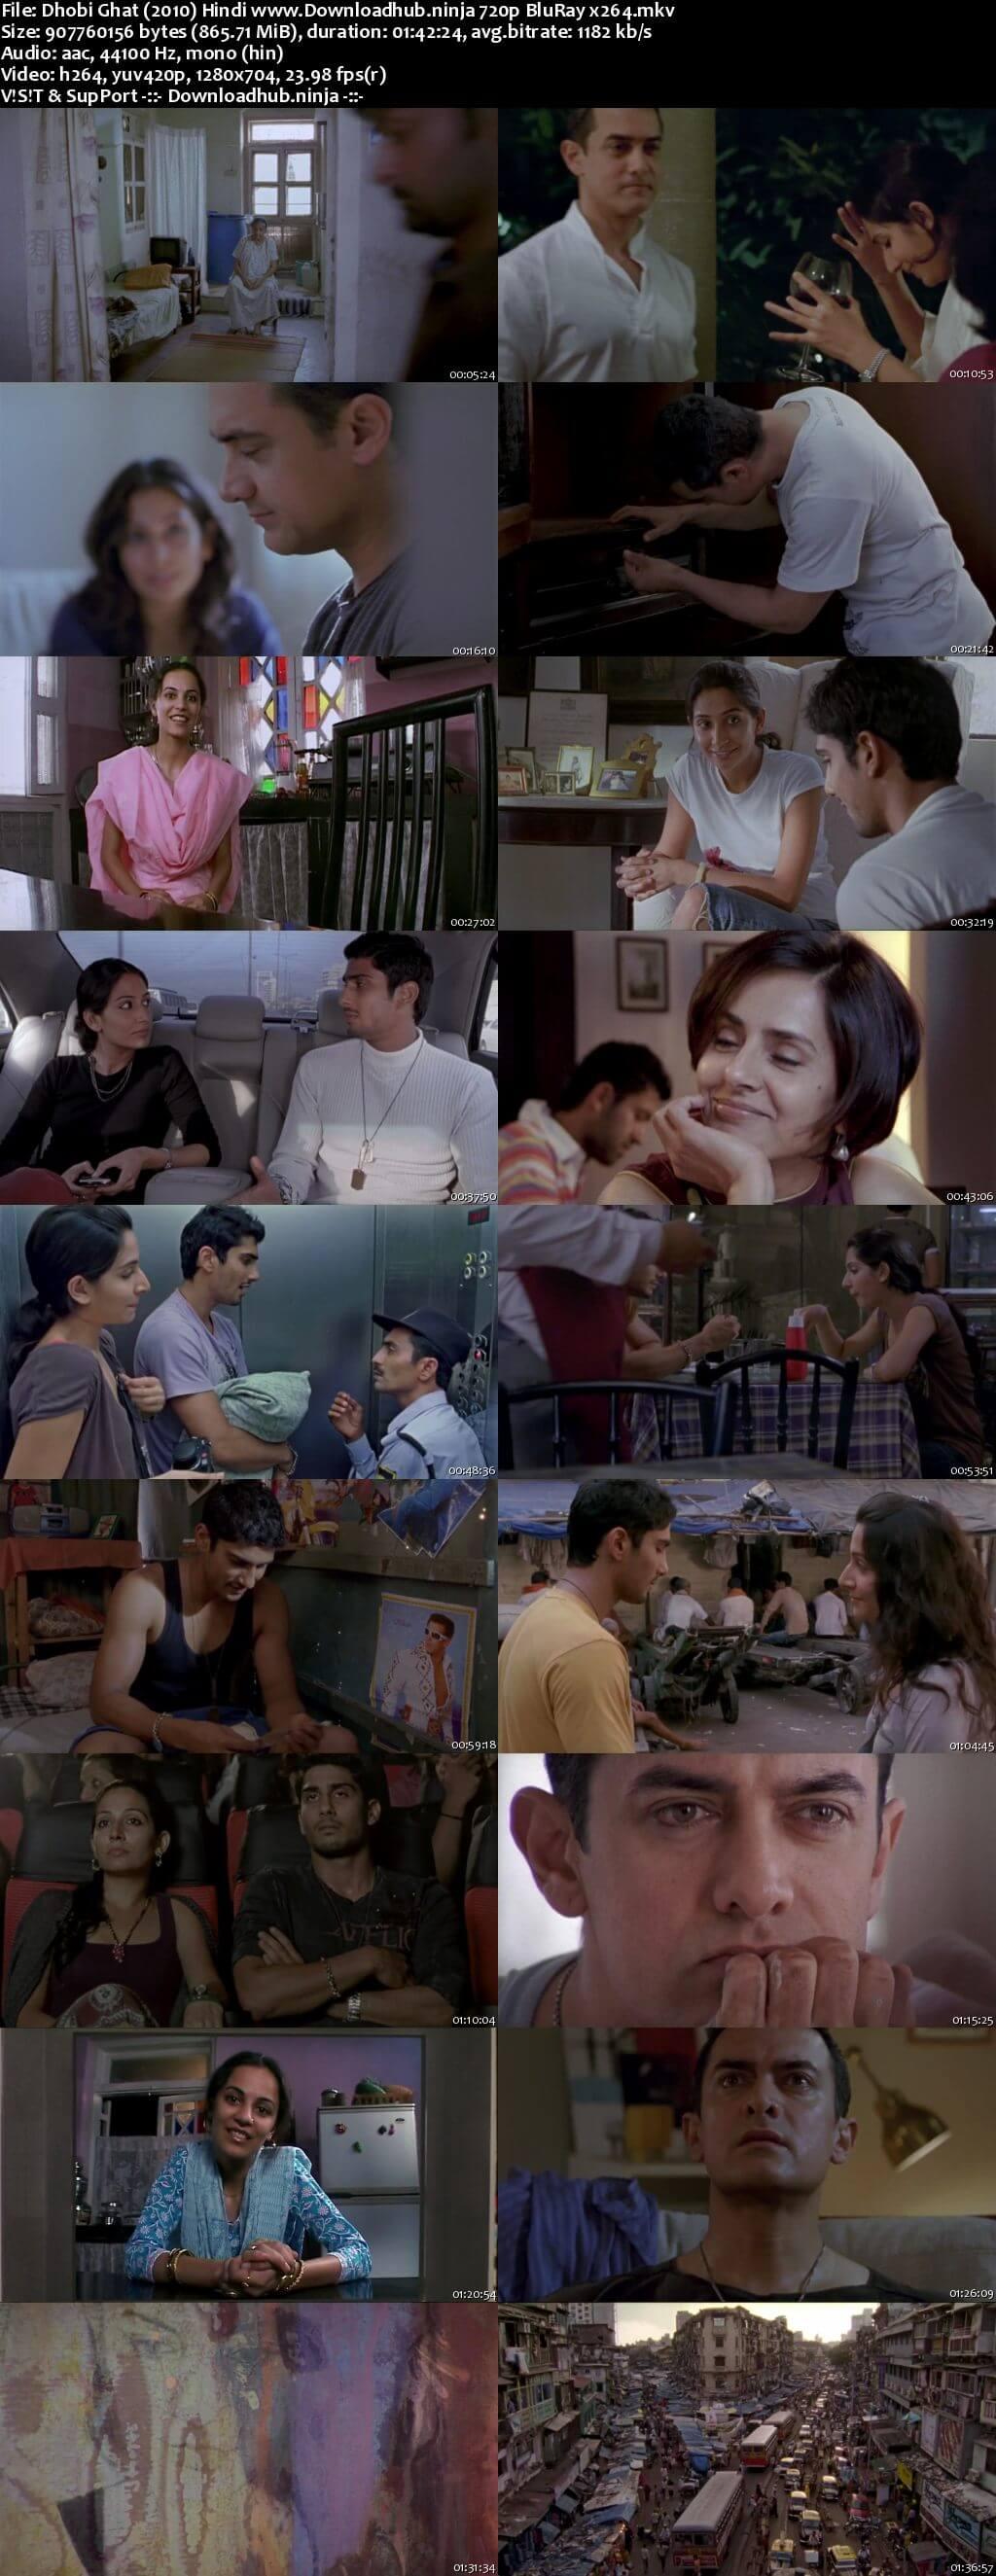 Dhobi Ghat 2010 Hindi 720p BluRay x264